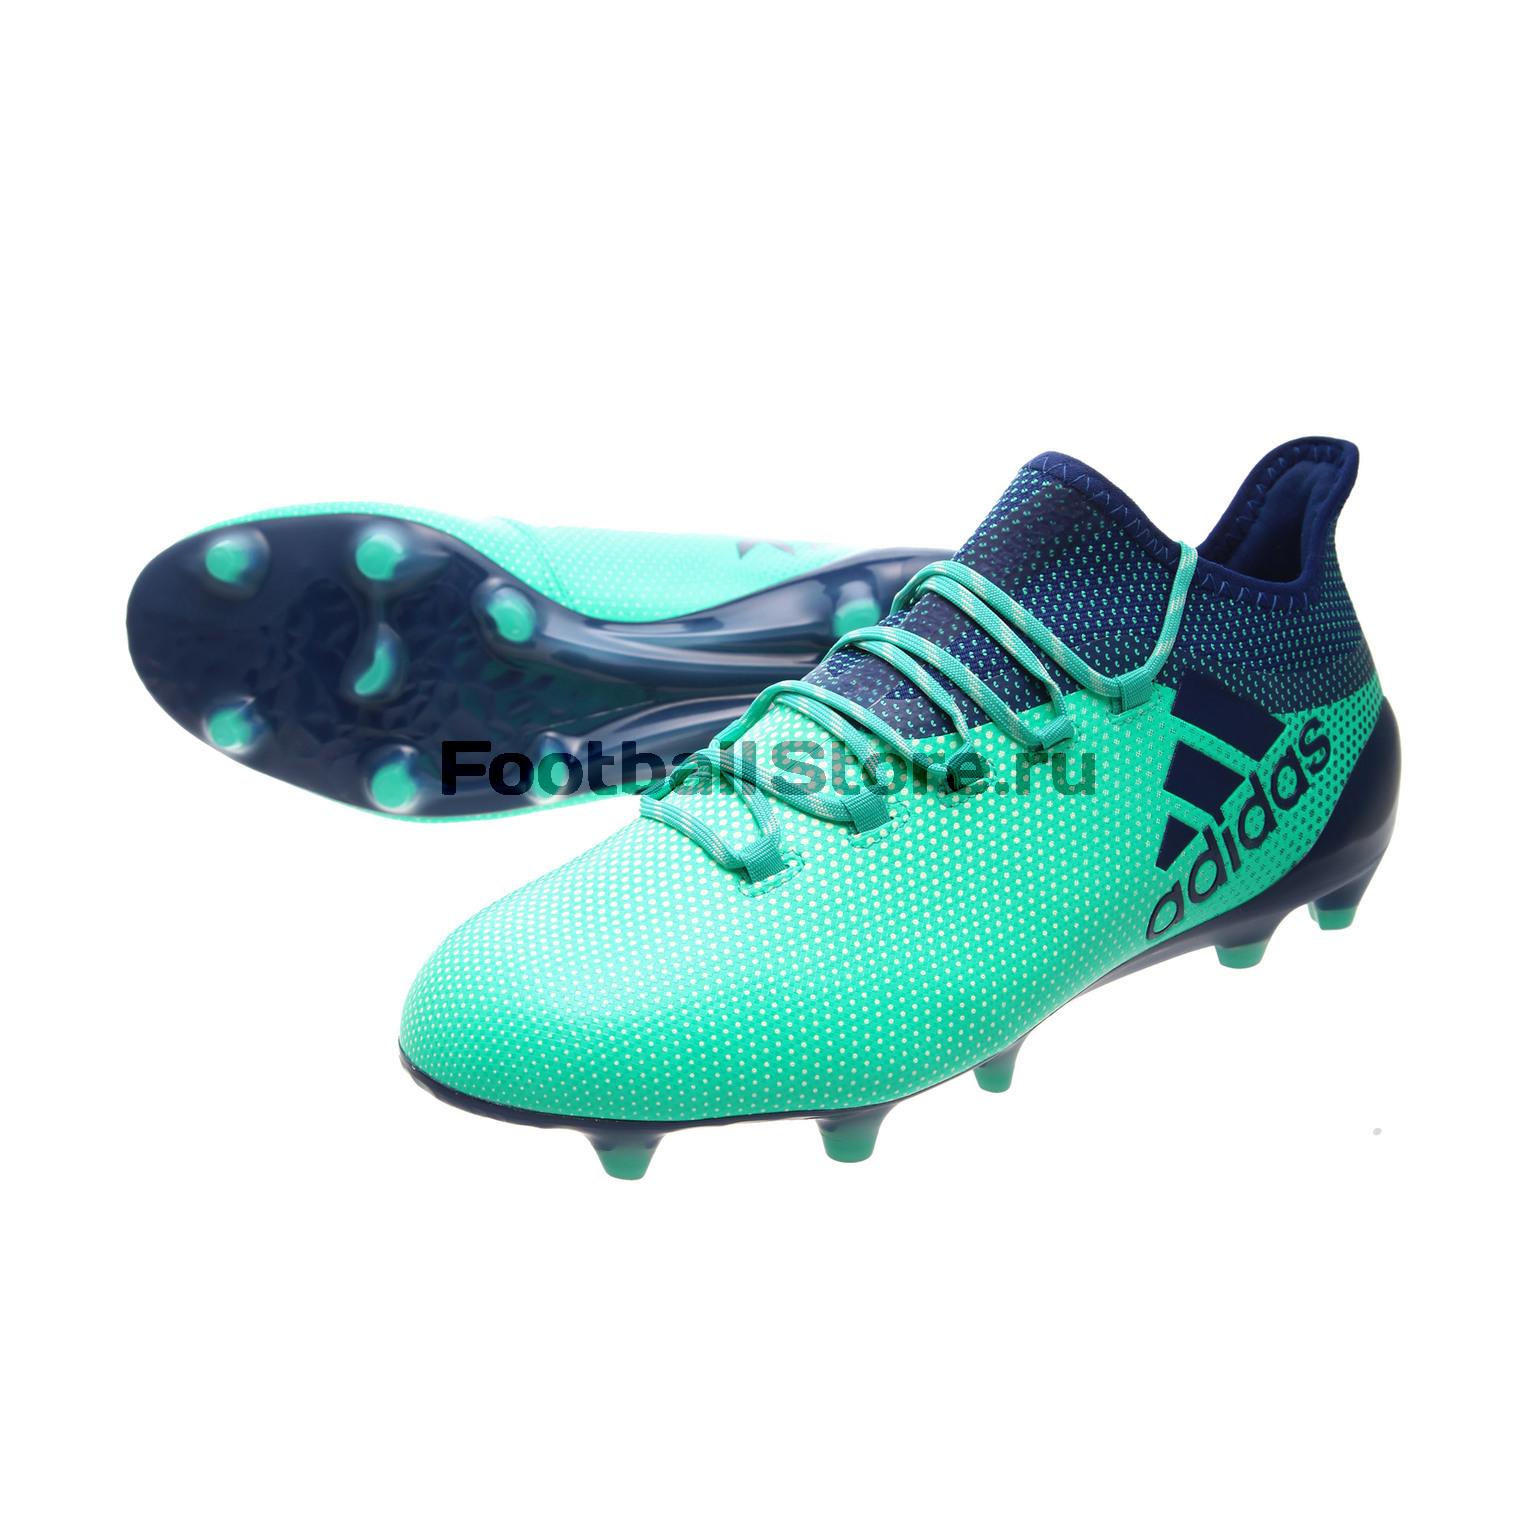 Бутсы Adidas X 17.1 FG CP9163 бутсы adidas x 17 1 fg bb6353